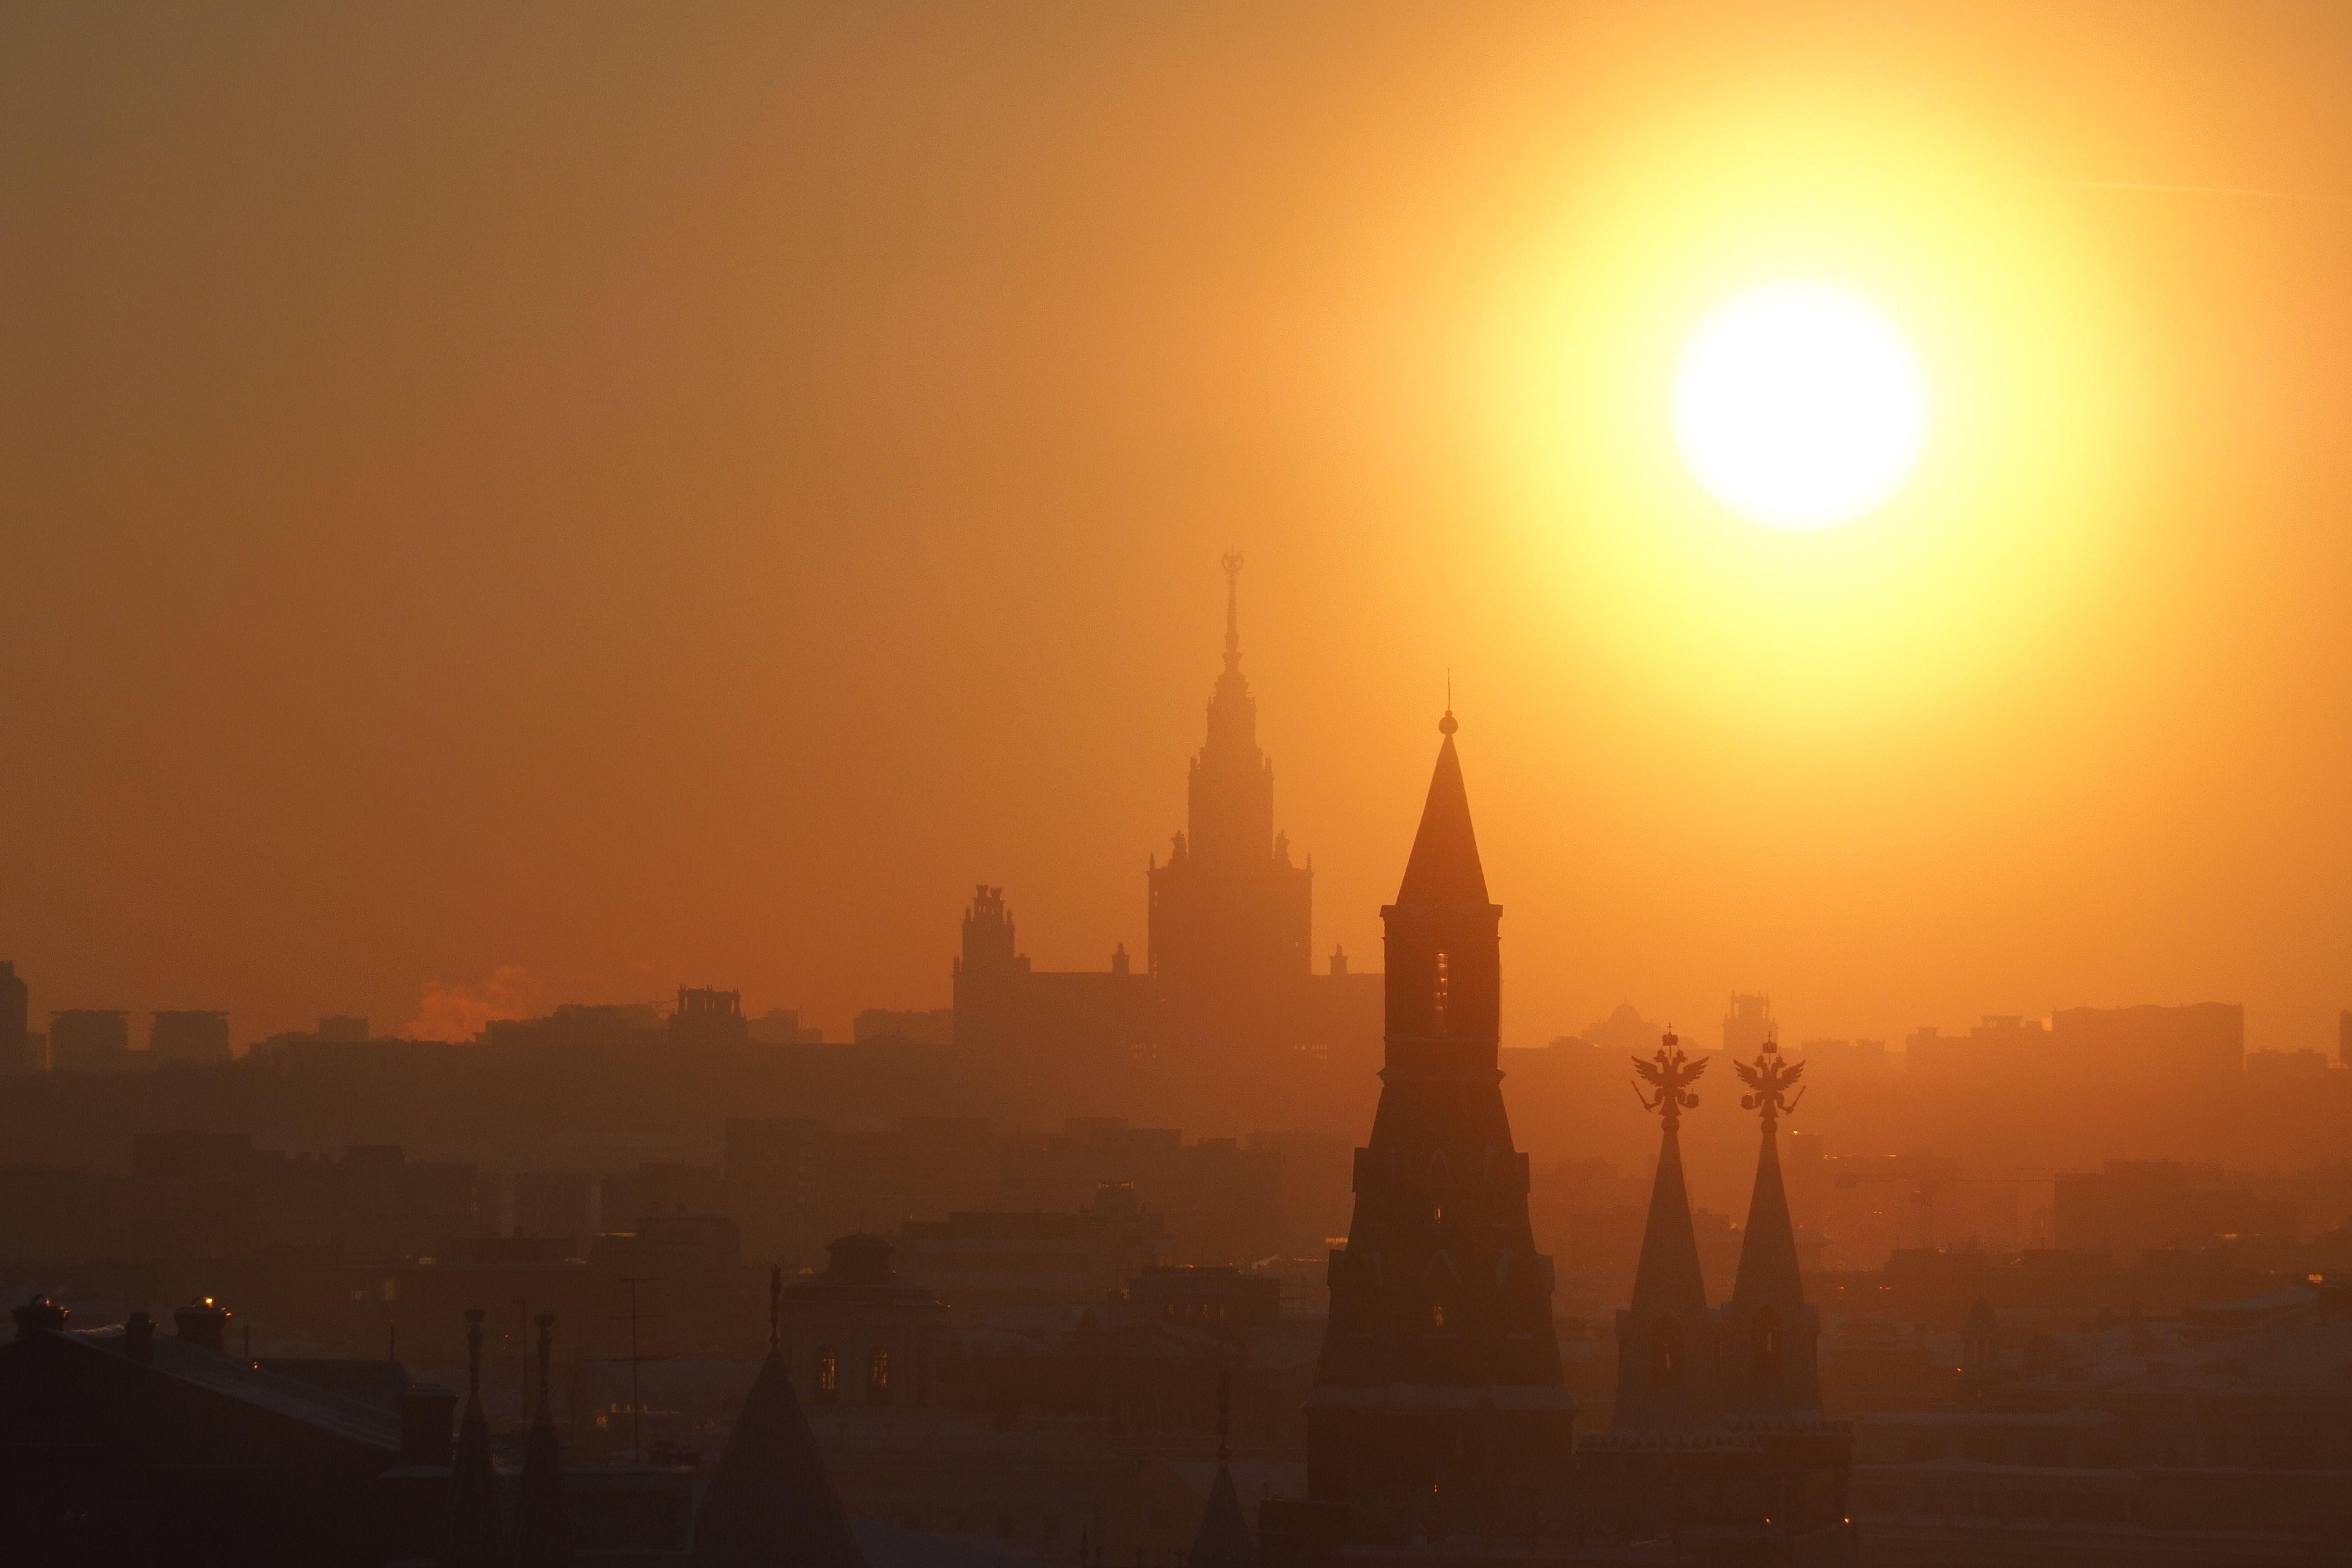 Москва прогреется почти до 30 градусов на три дня